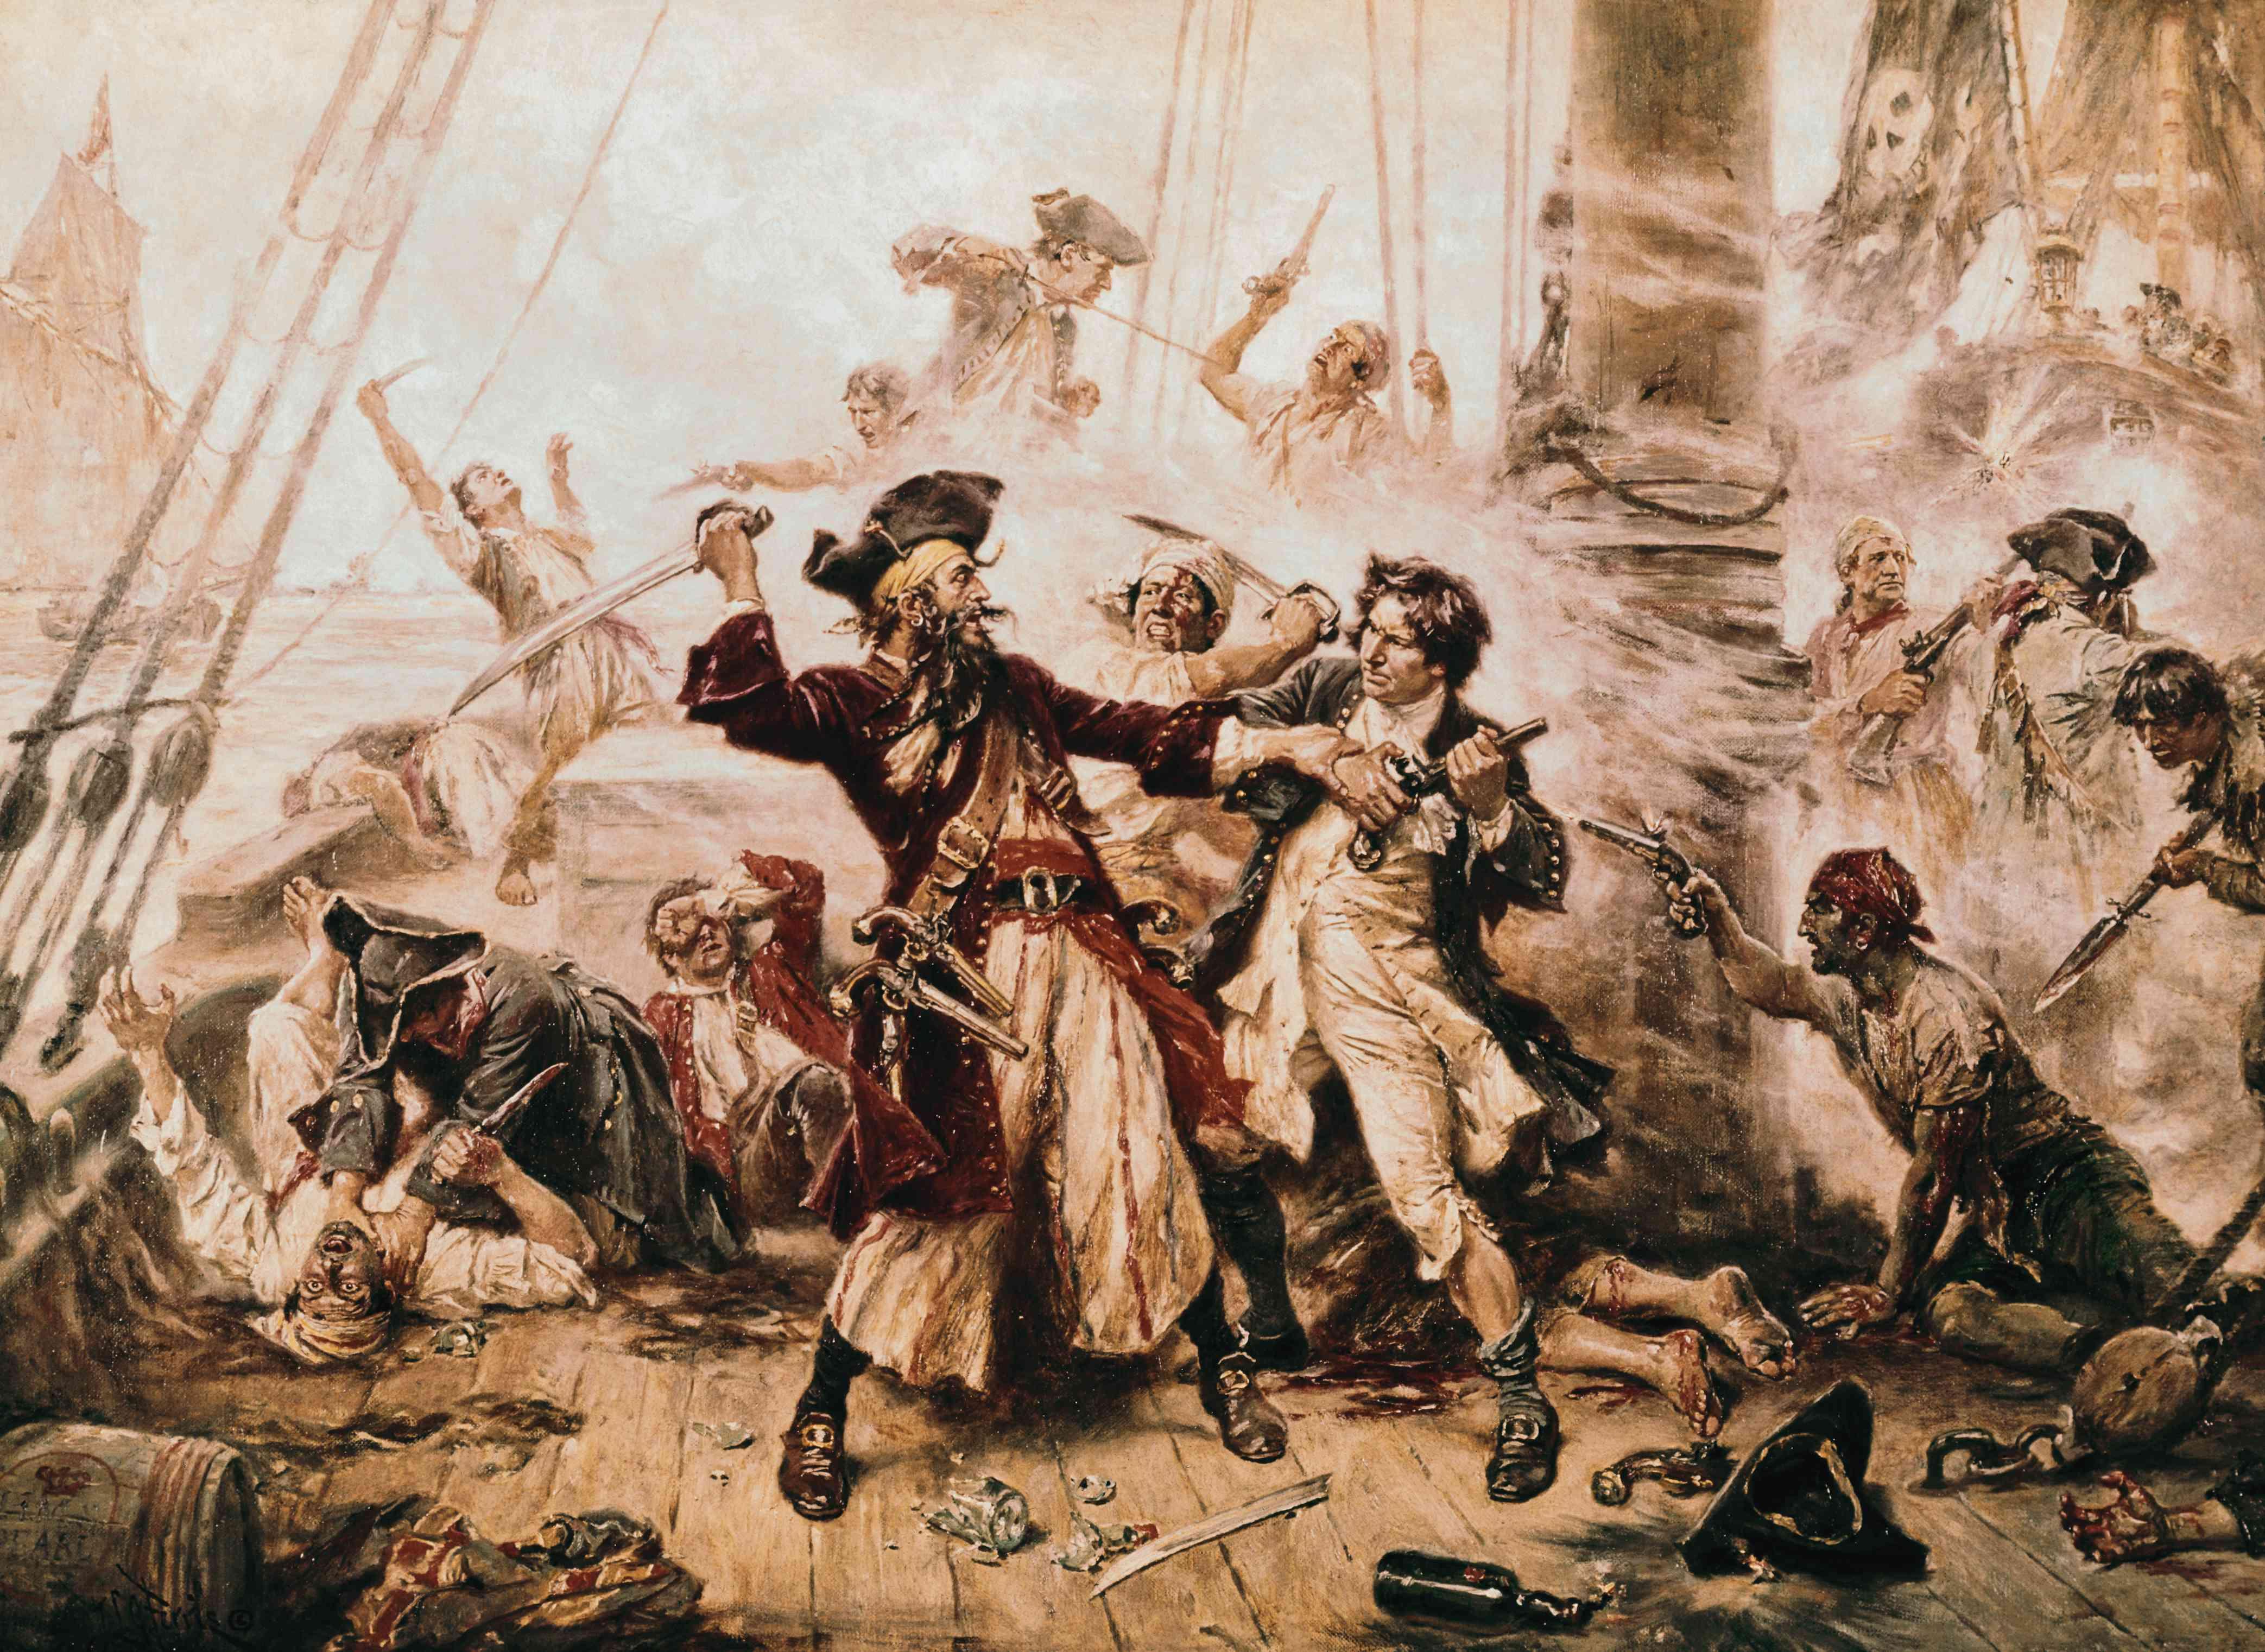 The Capture of the Pirate, Blackbeard, 1718 by Jean Leon Gerome Ferris